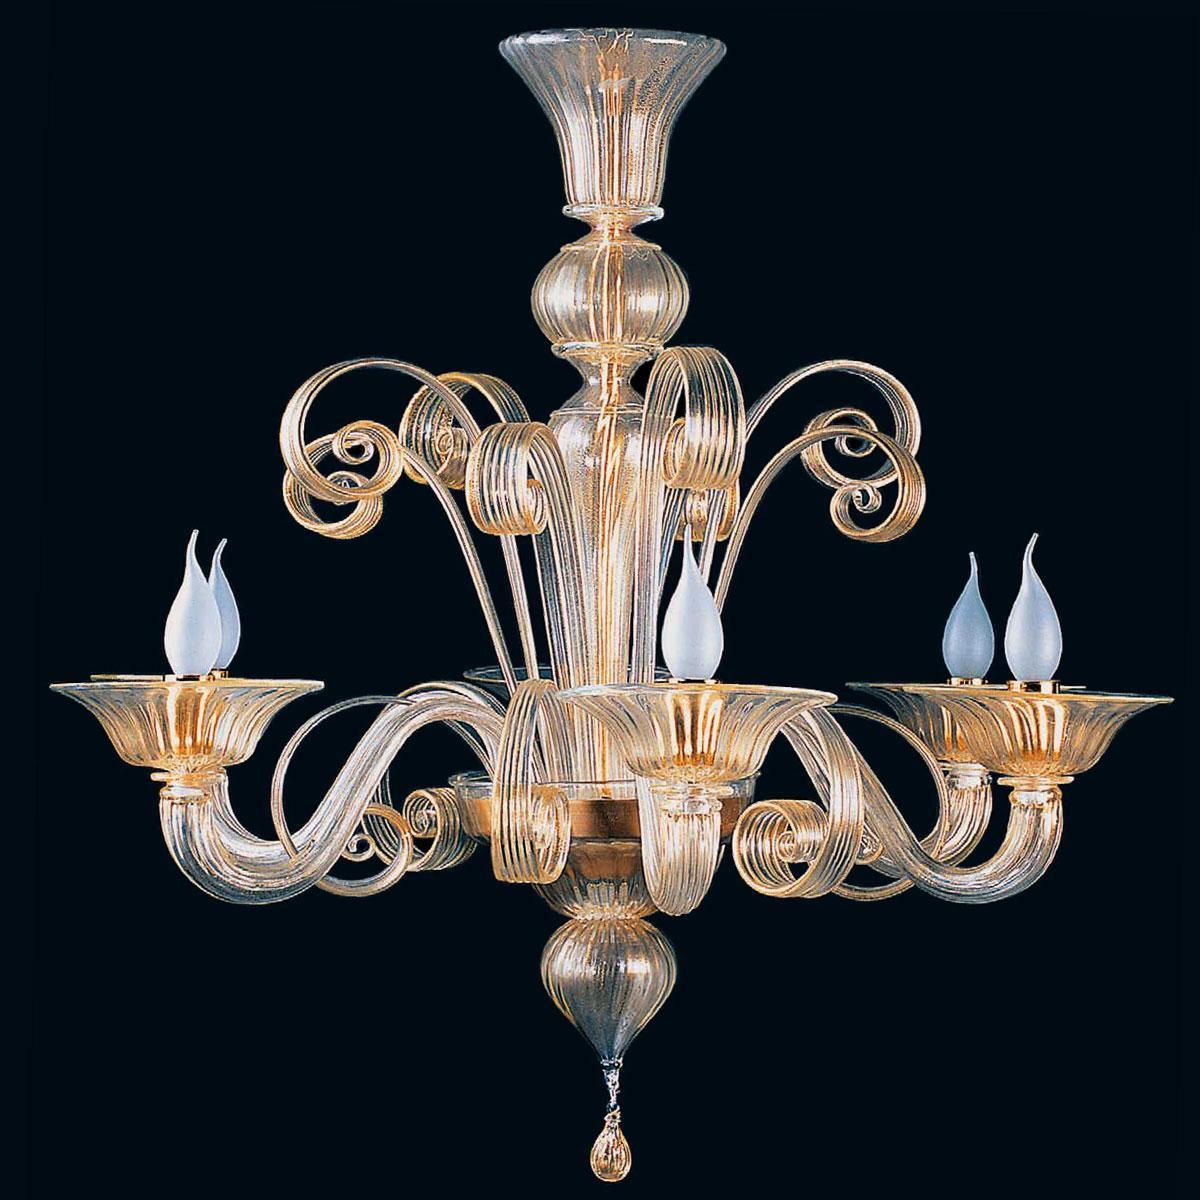 """Ima"" Murano glass chandelier - 6 lights - gold"